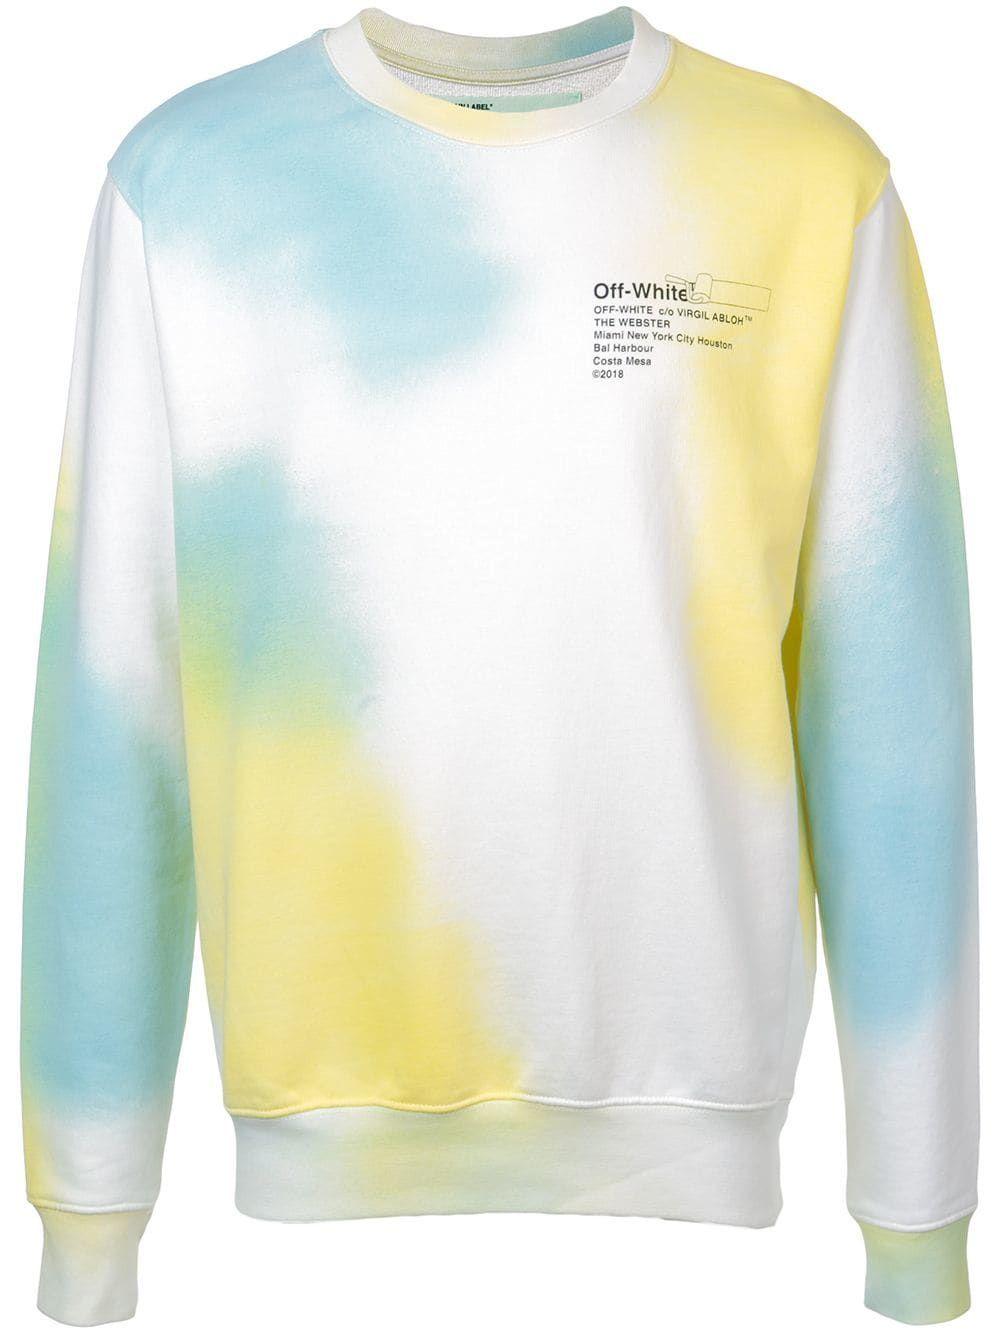 Pin By Allison Hoffman On Natured Sweatshirt Inspo Tie Dye Sweatshirt White Tie Off White Sweatshirt [ 1334 x 1000 Pixel ]